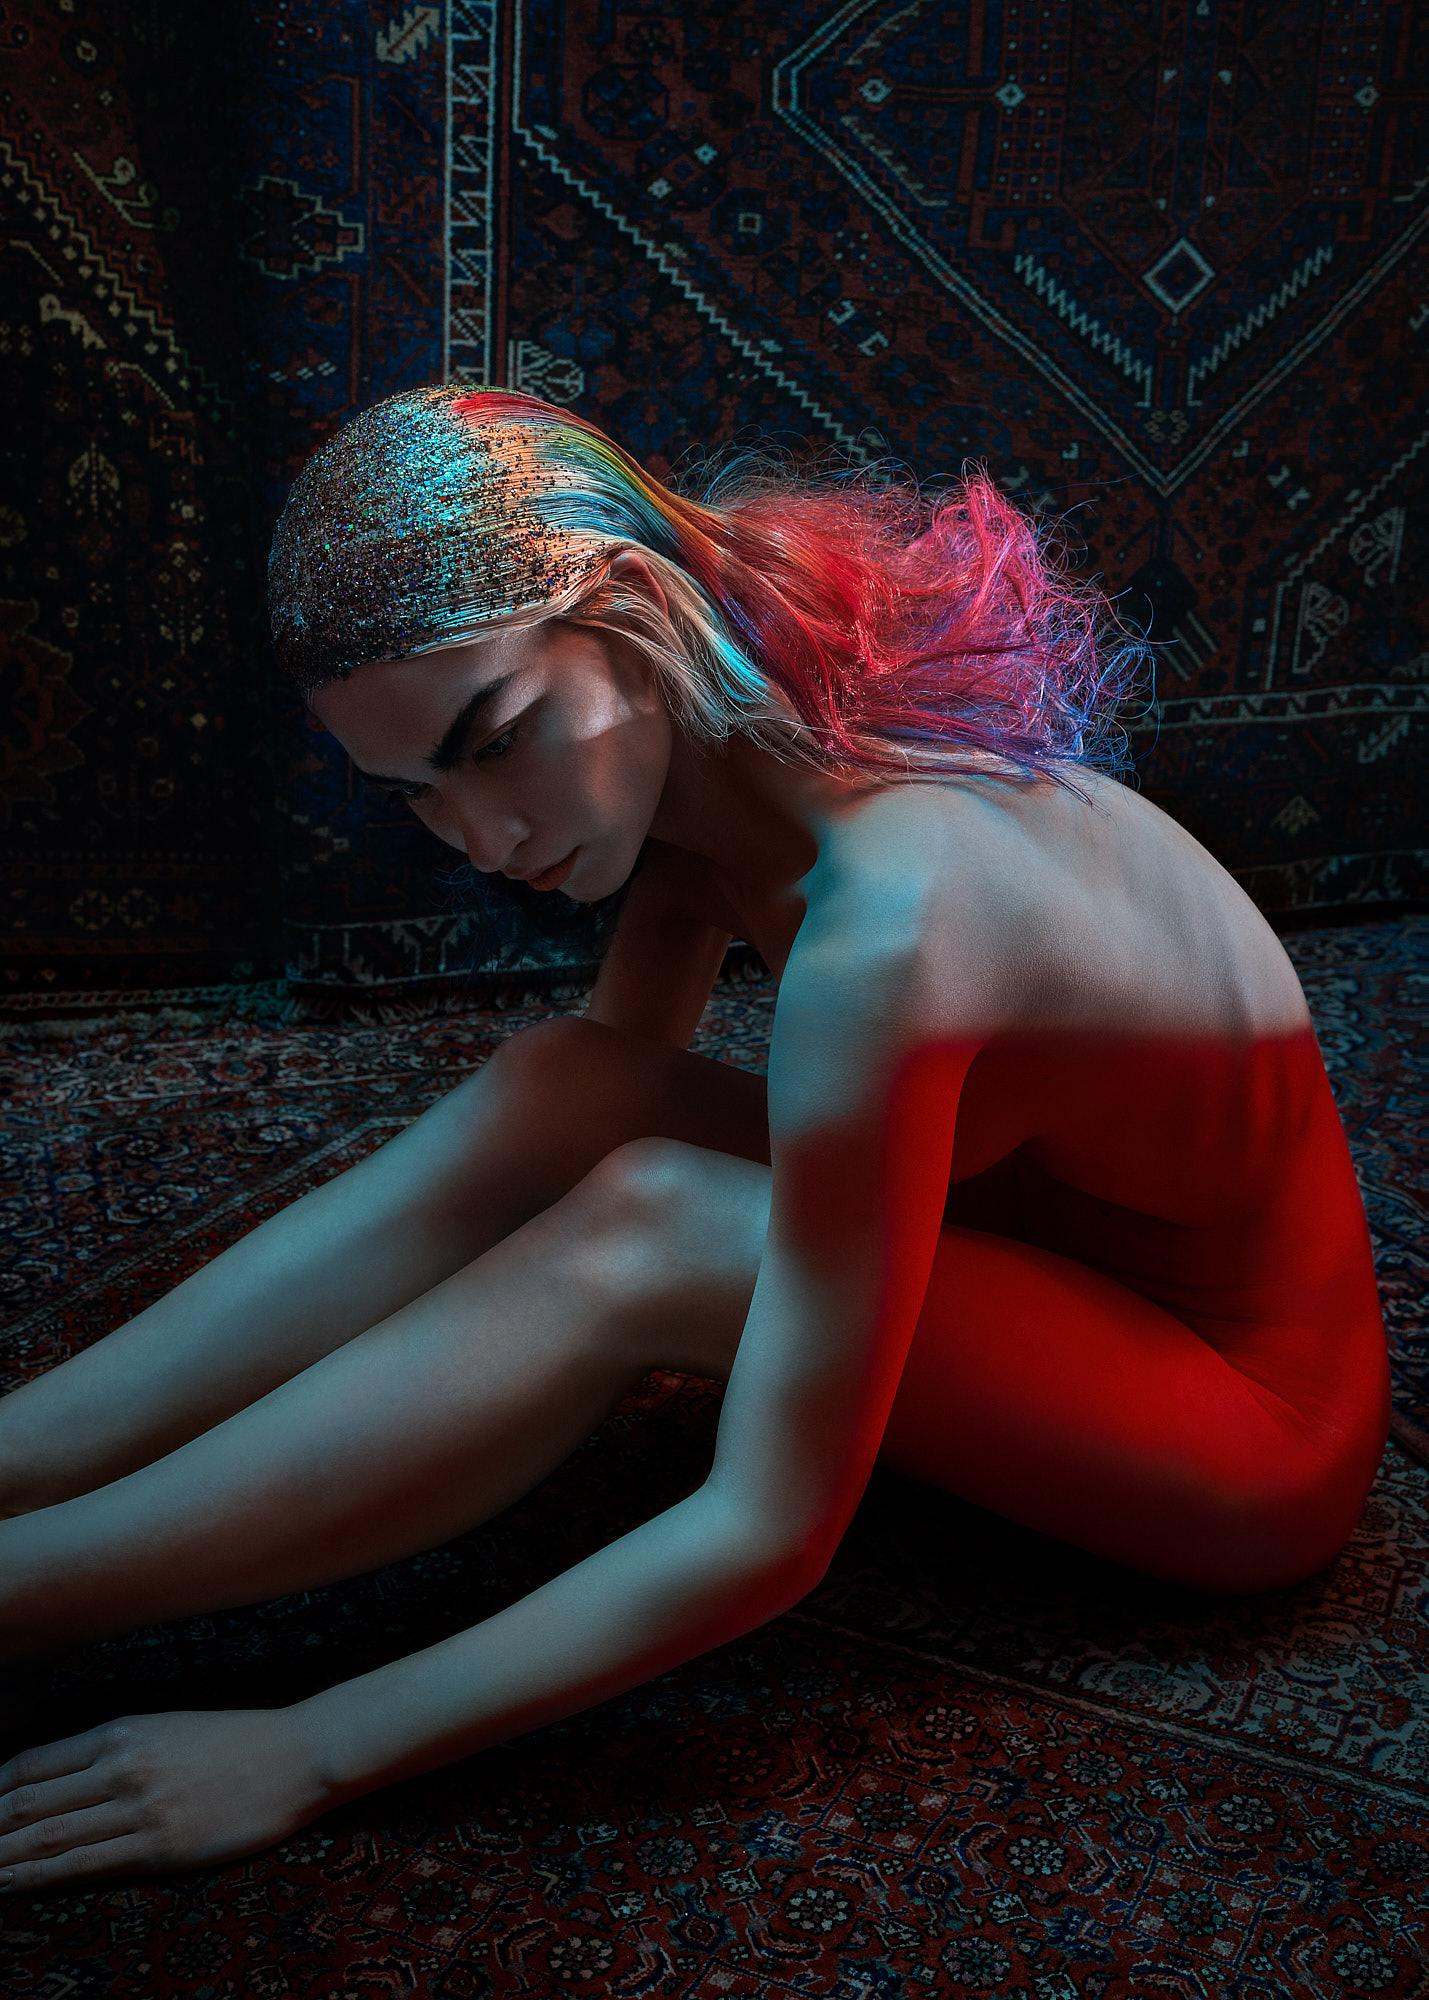 ATWINS_Red_Light_Glitter_0001